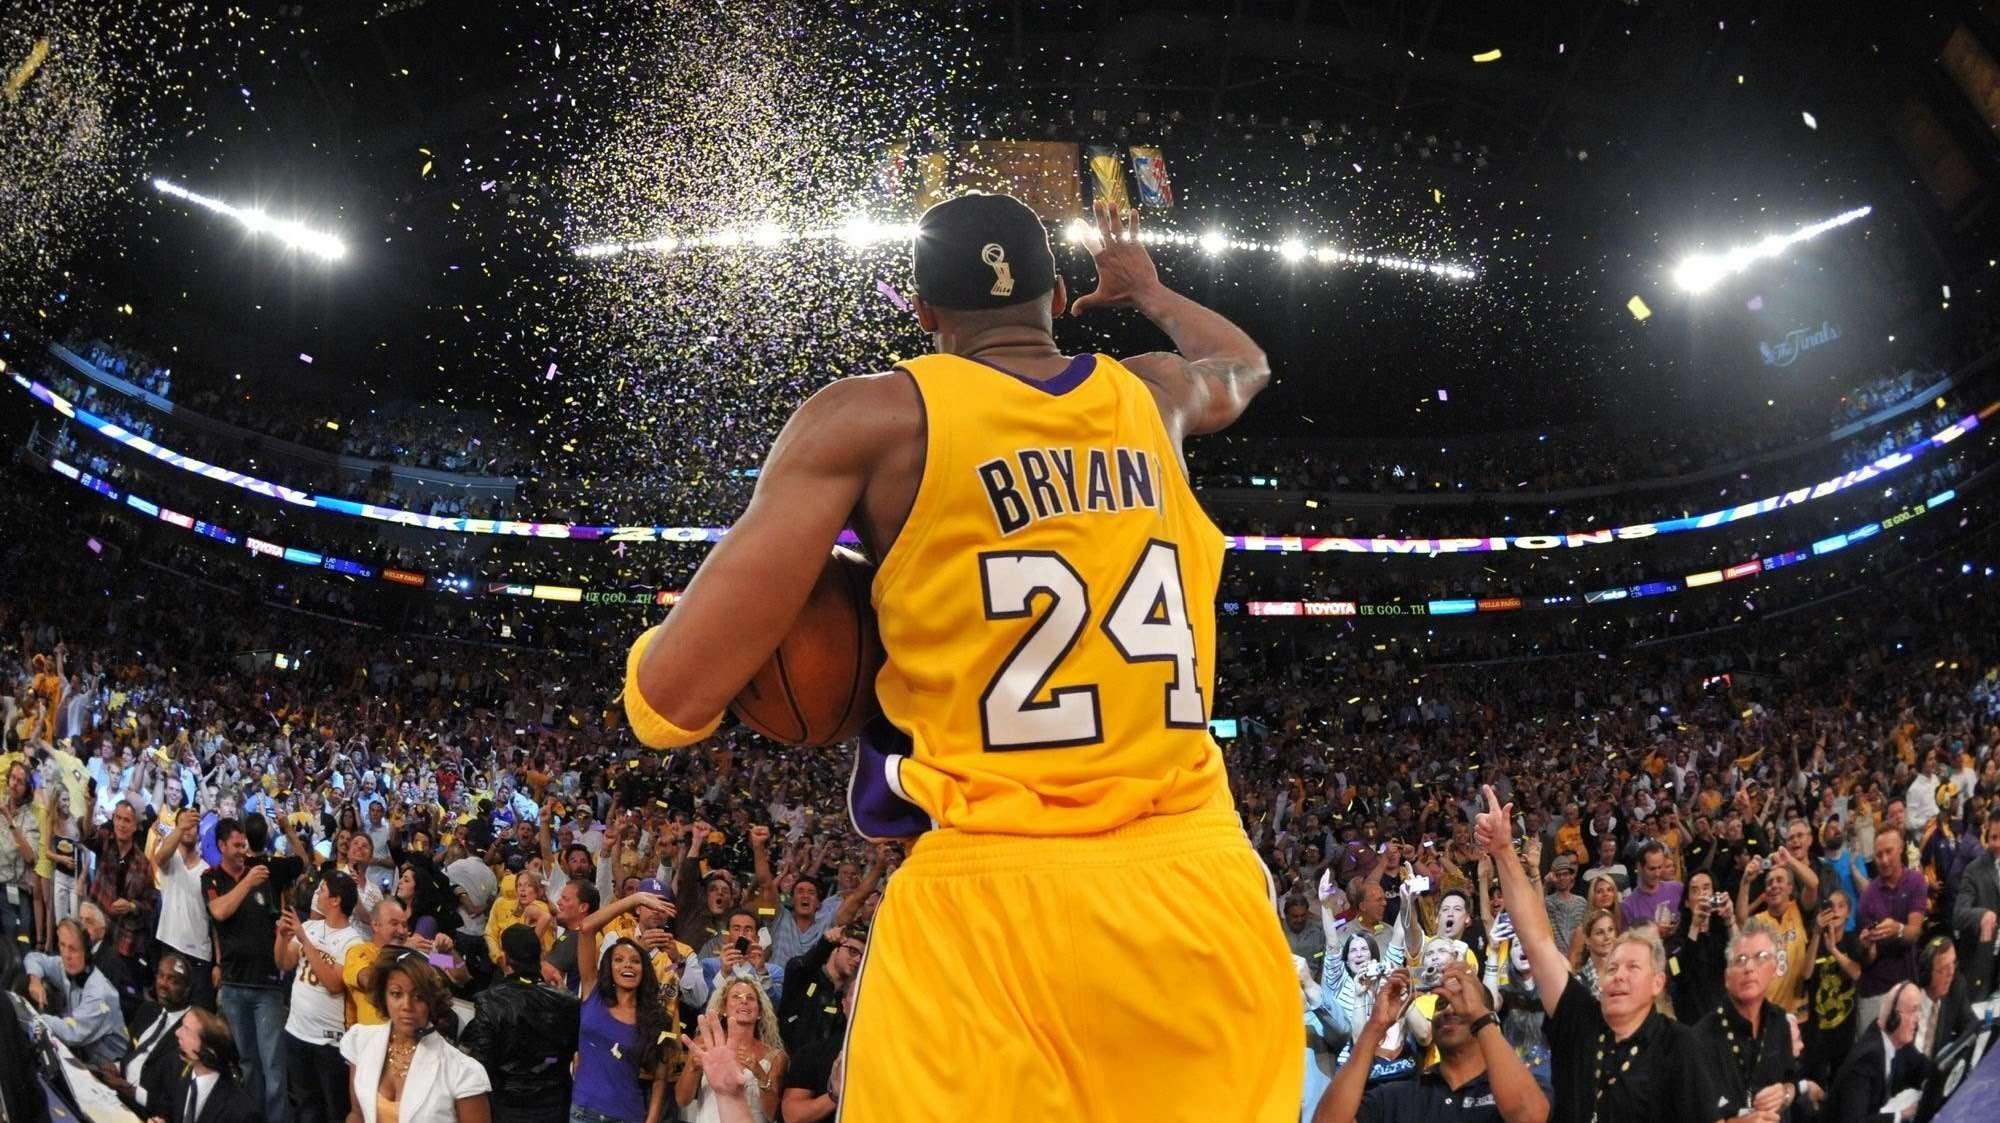 Nba Kobe Bryant Wallpaper: Kobe Bryant Dunk Wallpaper (70+ Images